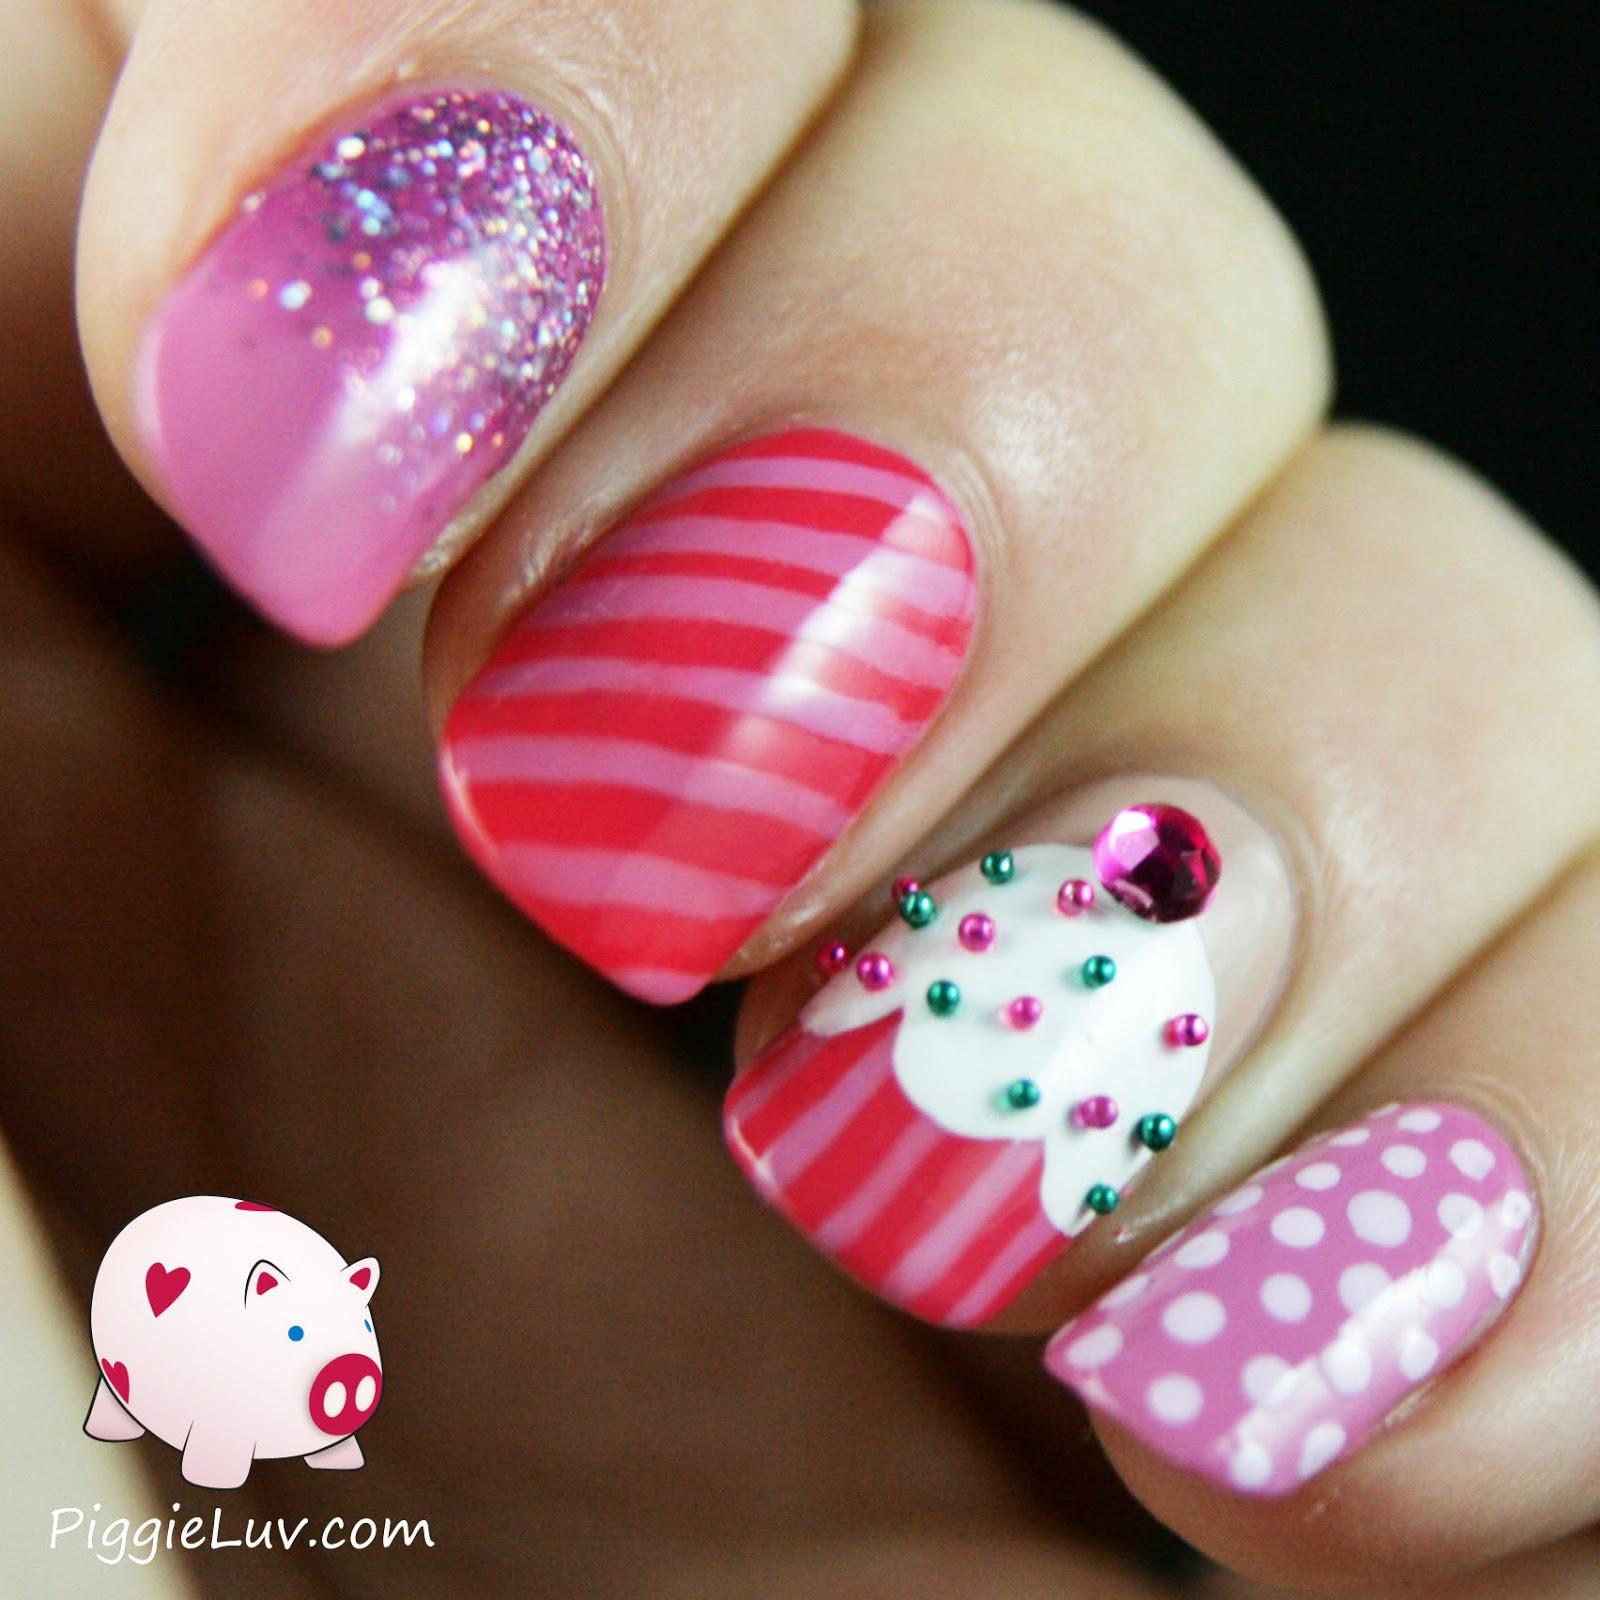 PiggieLuv: Cupcake nail art , very tasty